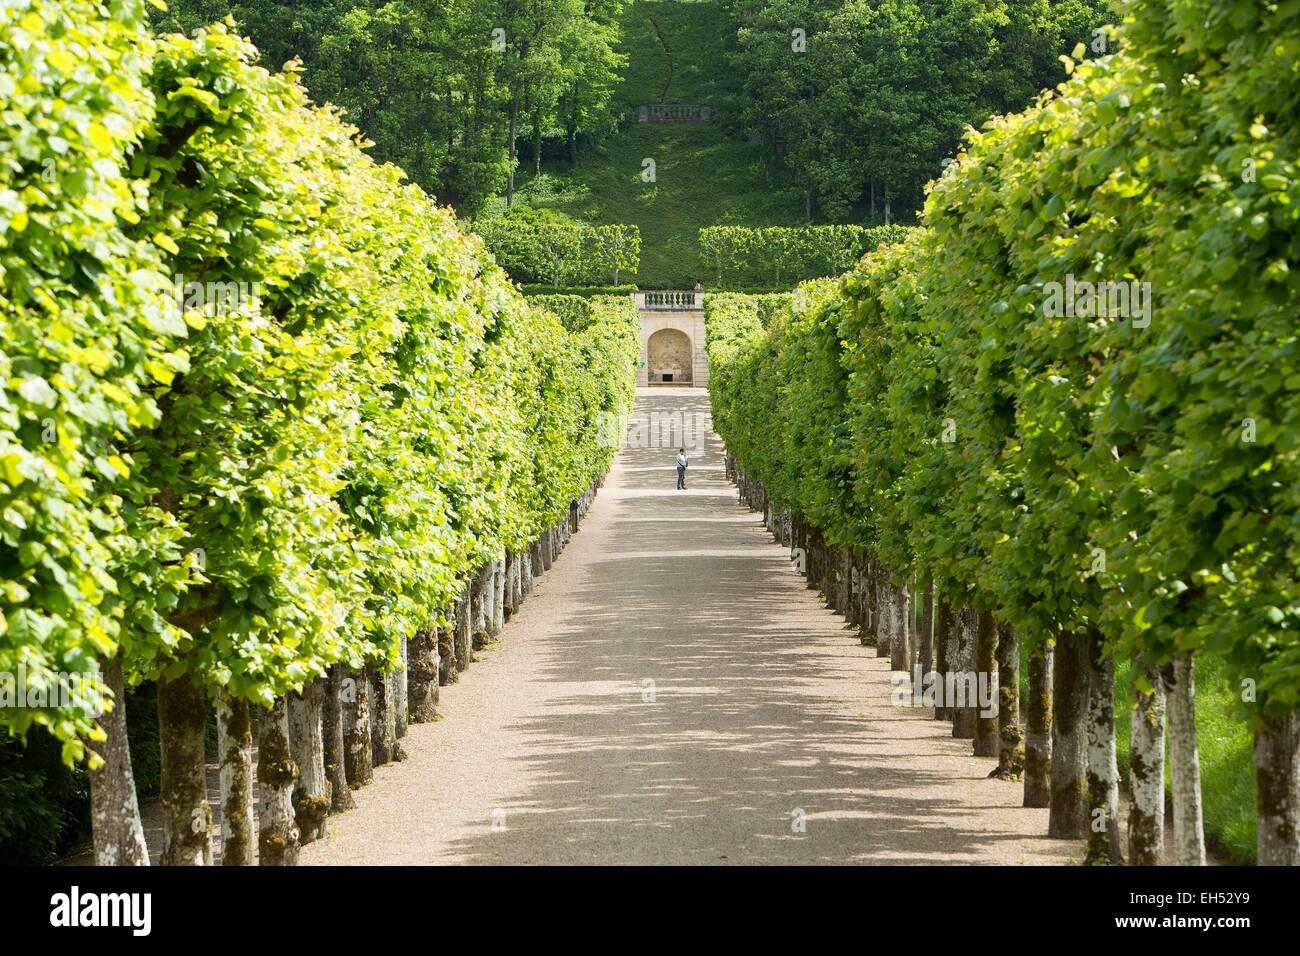 France, Indre et Loire, Loire Valley listed as World Heritage by UNESCO, Villandry, castle of Villandry gardens - Stock Image